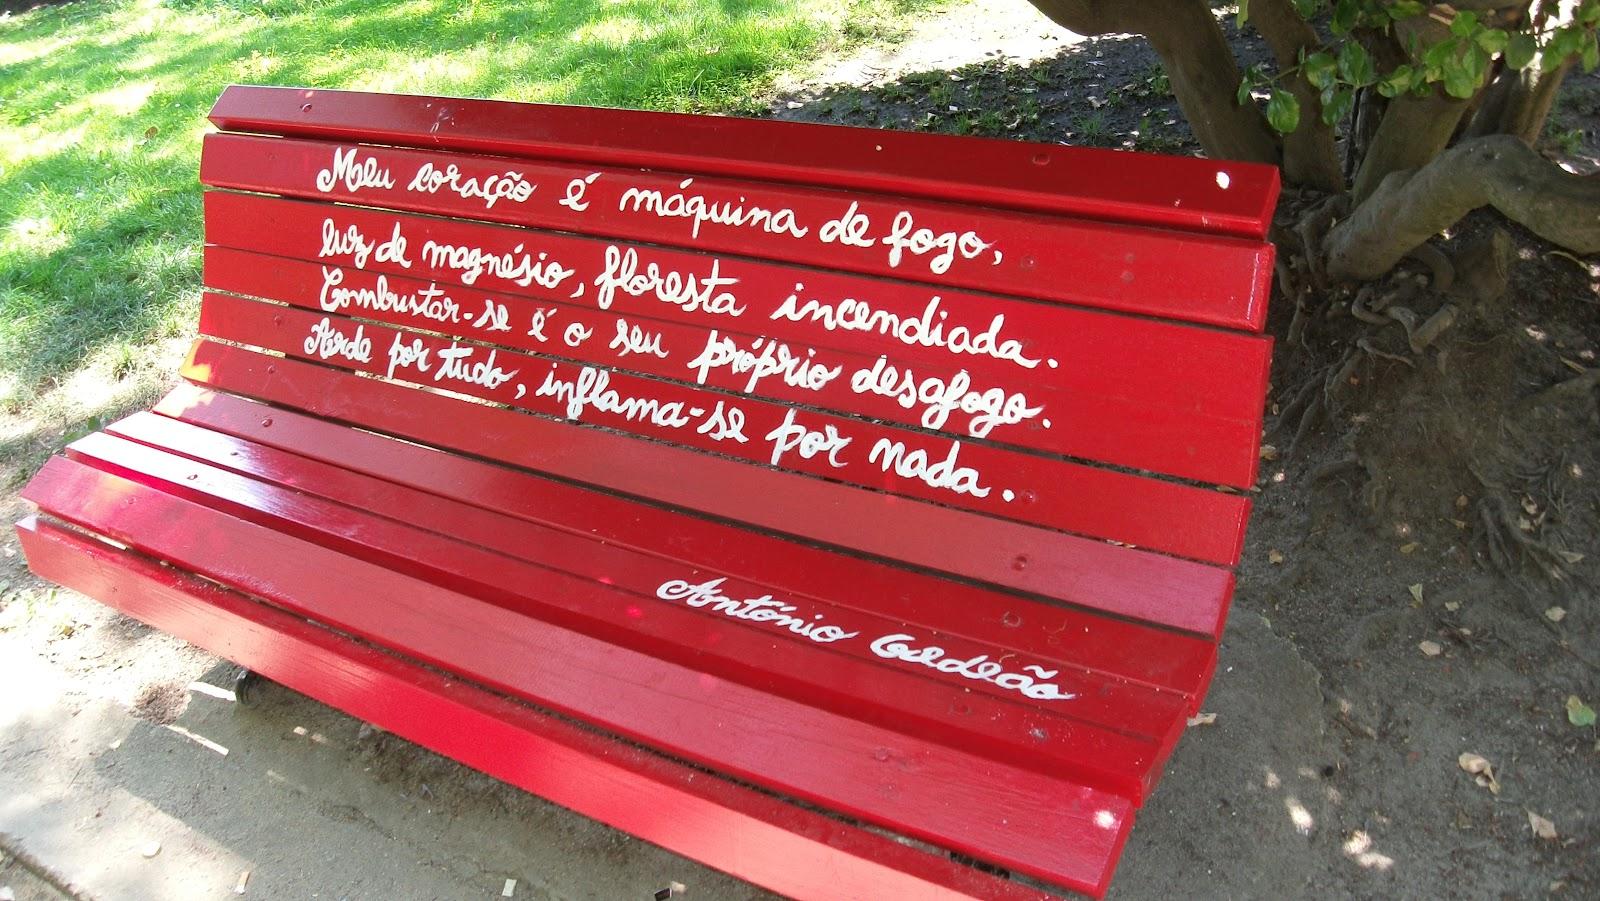 banco de jardim poesia: simples: poesia em bancos de jardim (Largo Luís de Camões